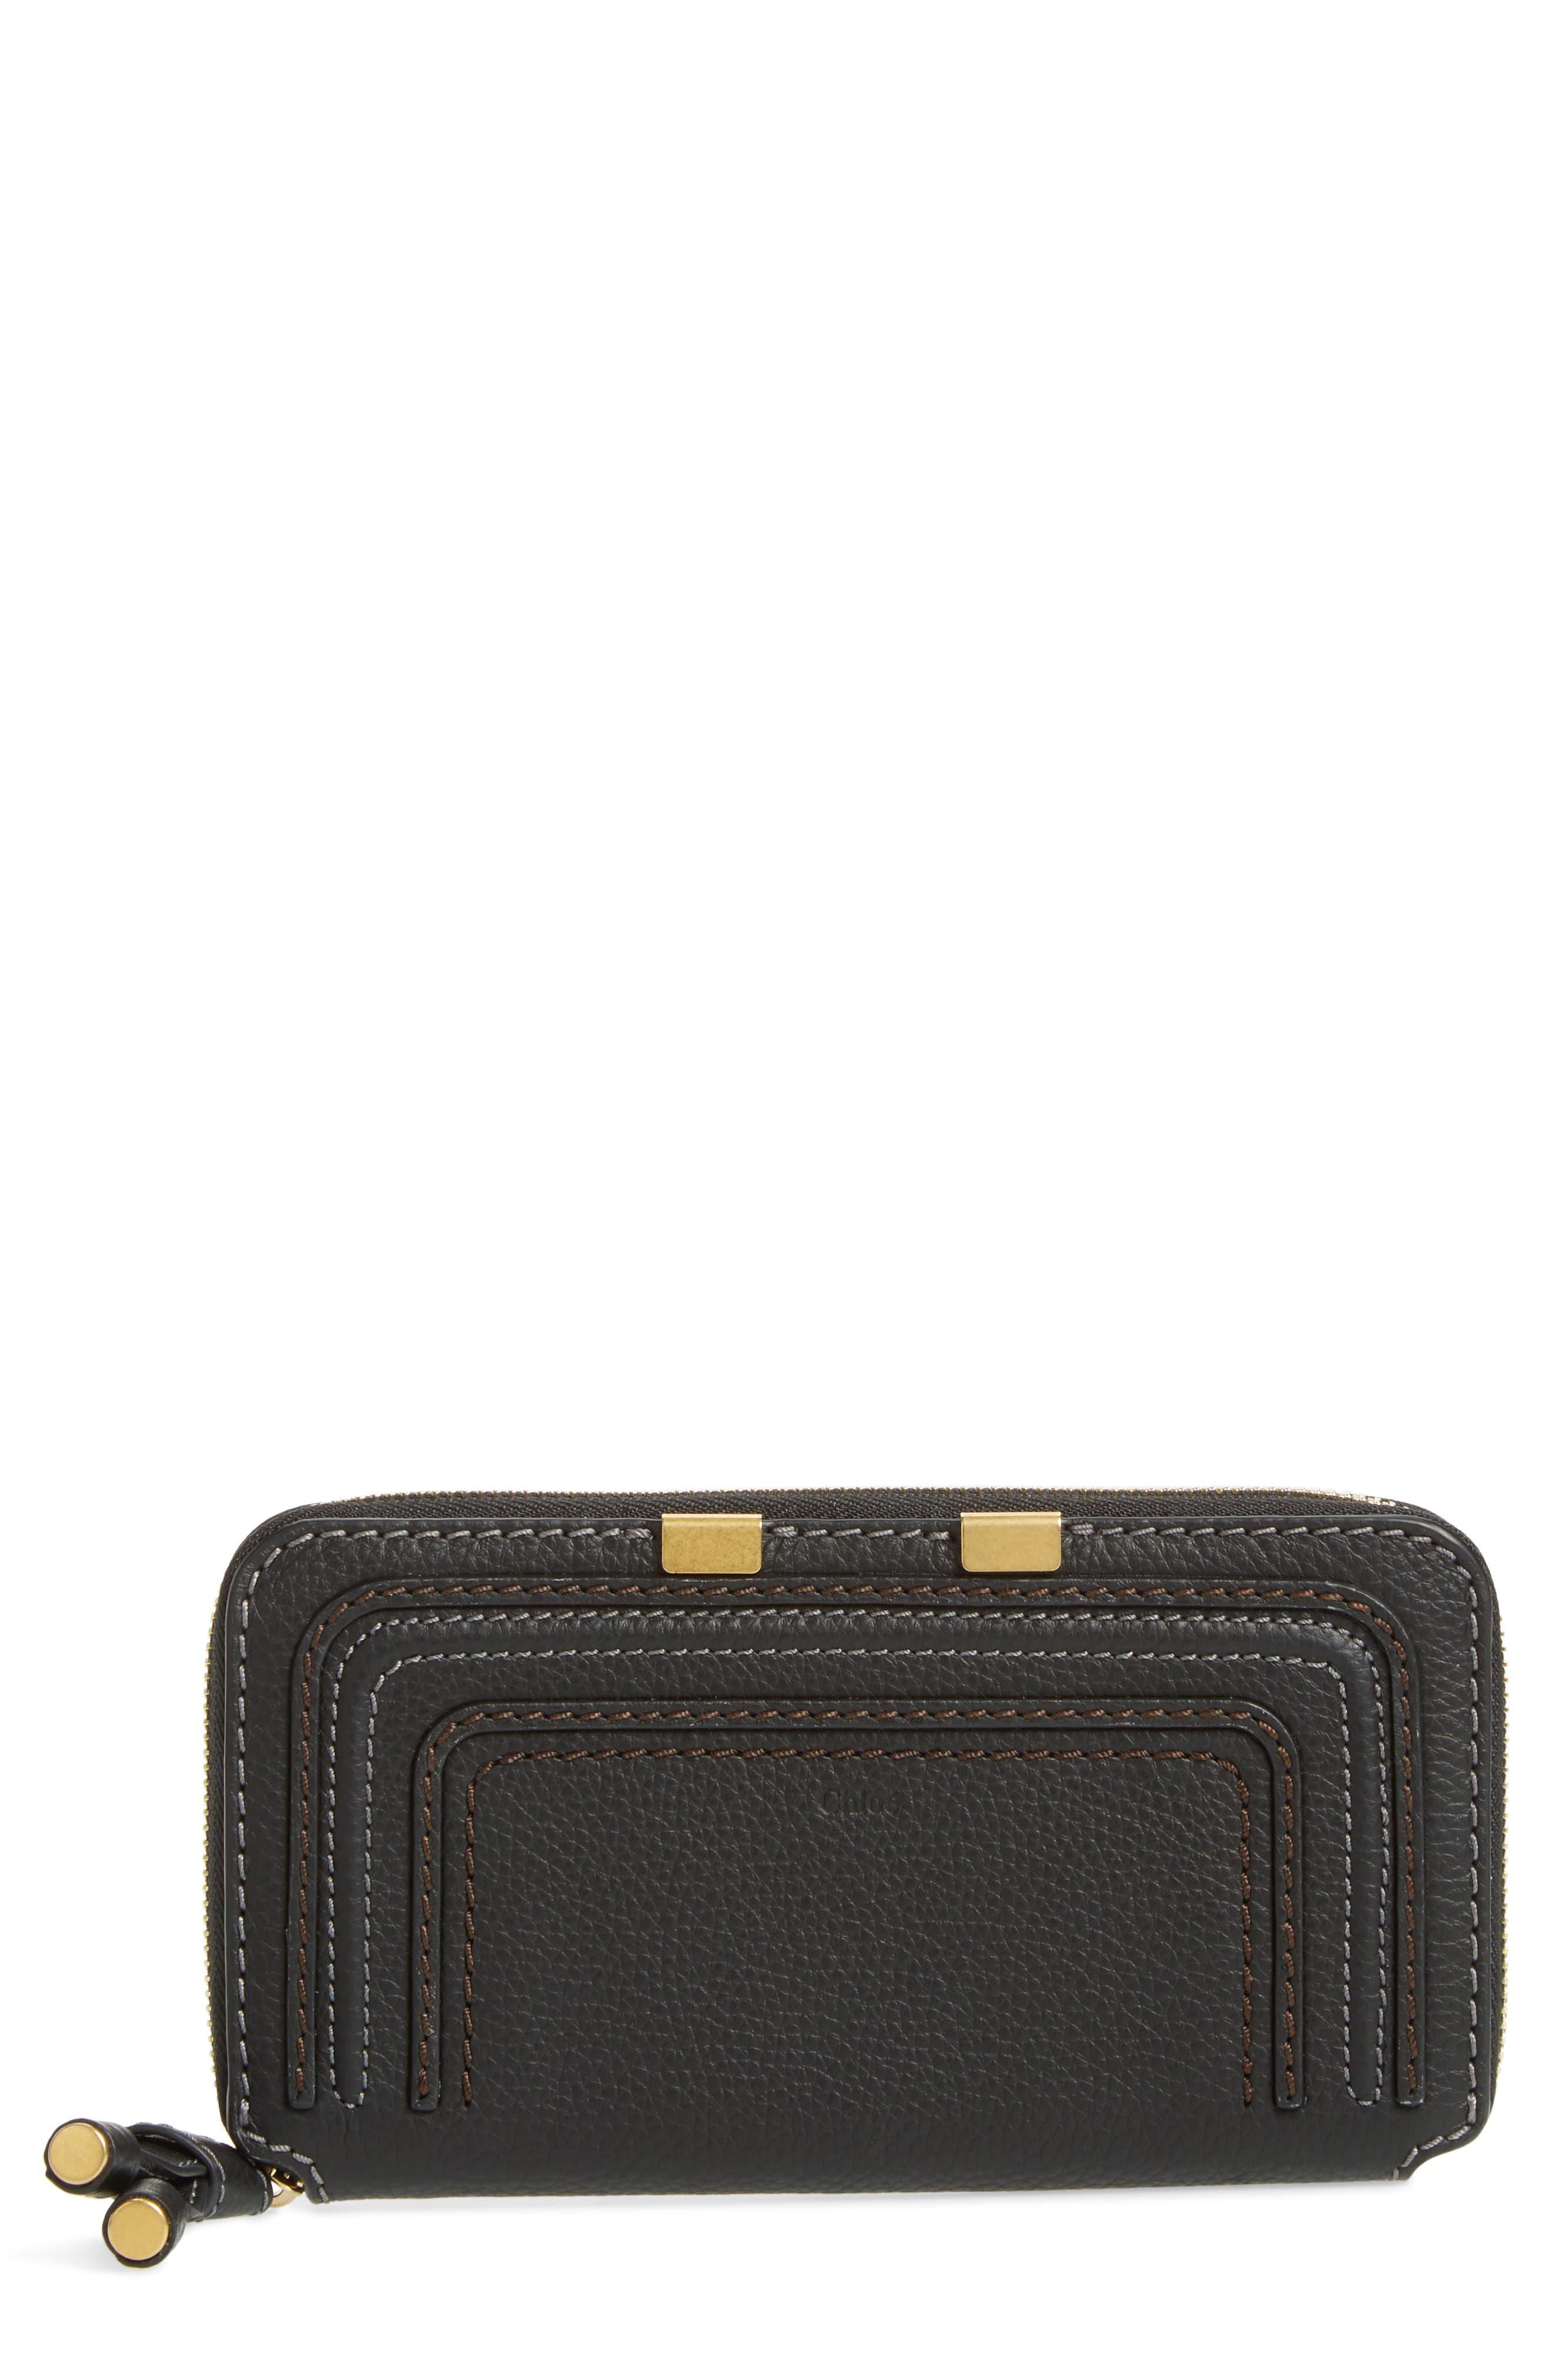 Alternate Image 1 Selected - Chloé 'Marcie - Long' Zip Around Wallet